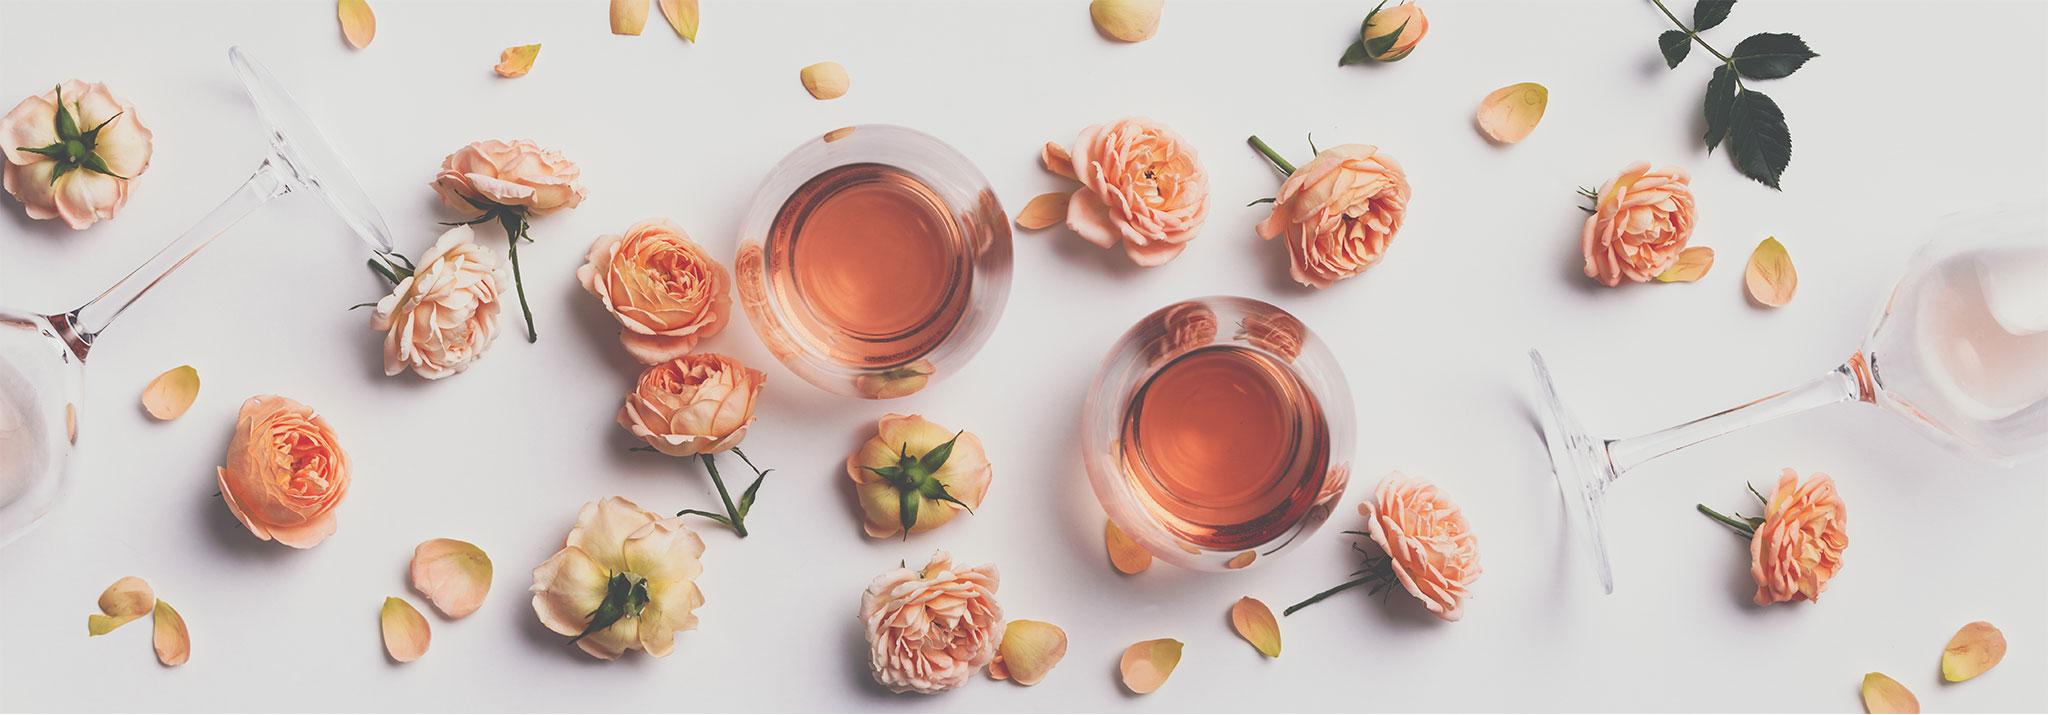 rose-wines-gustoworld